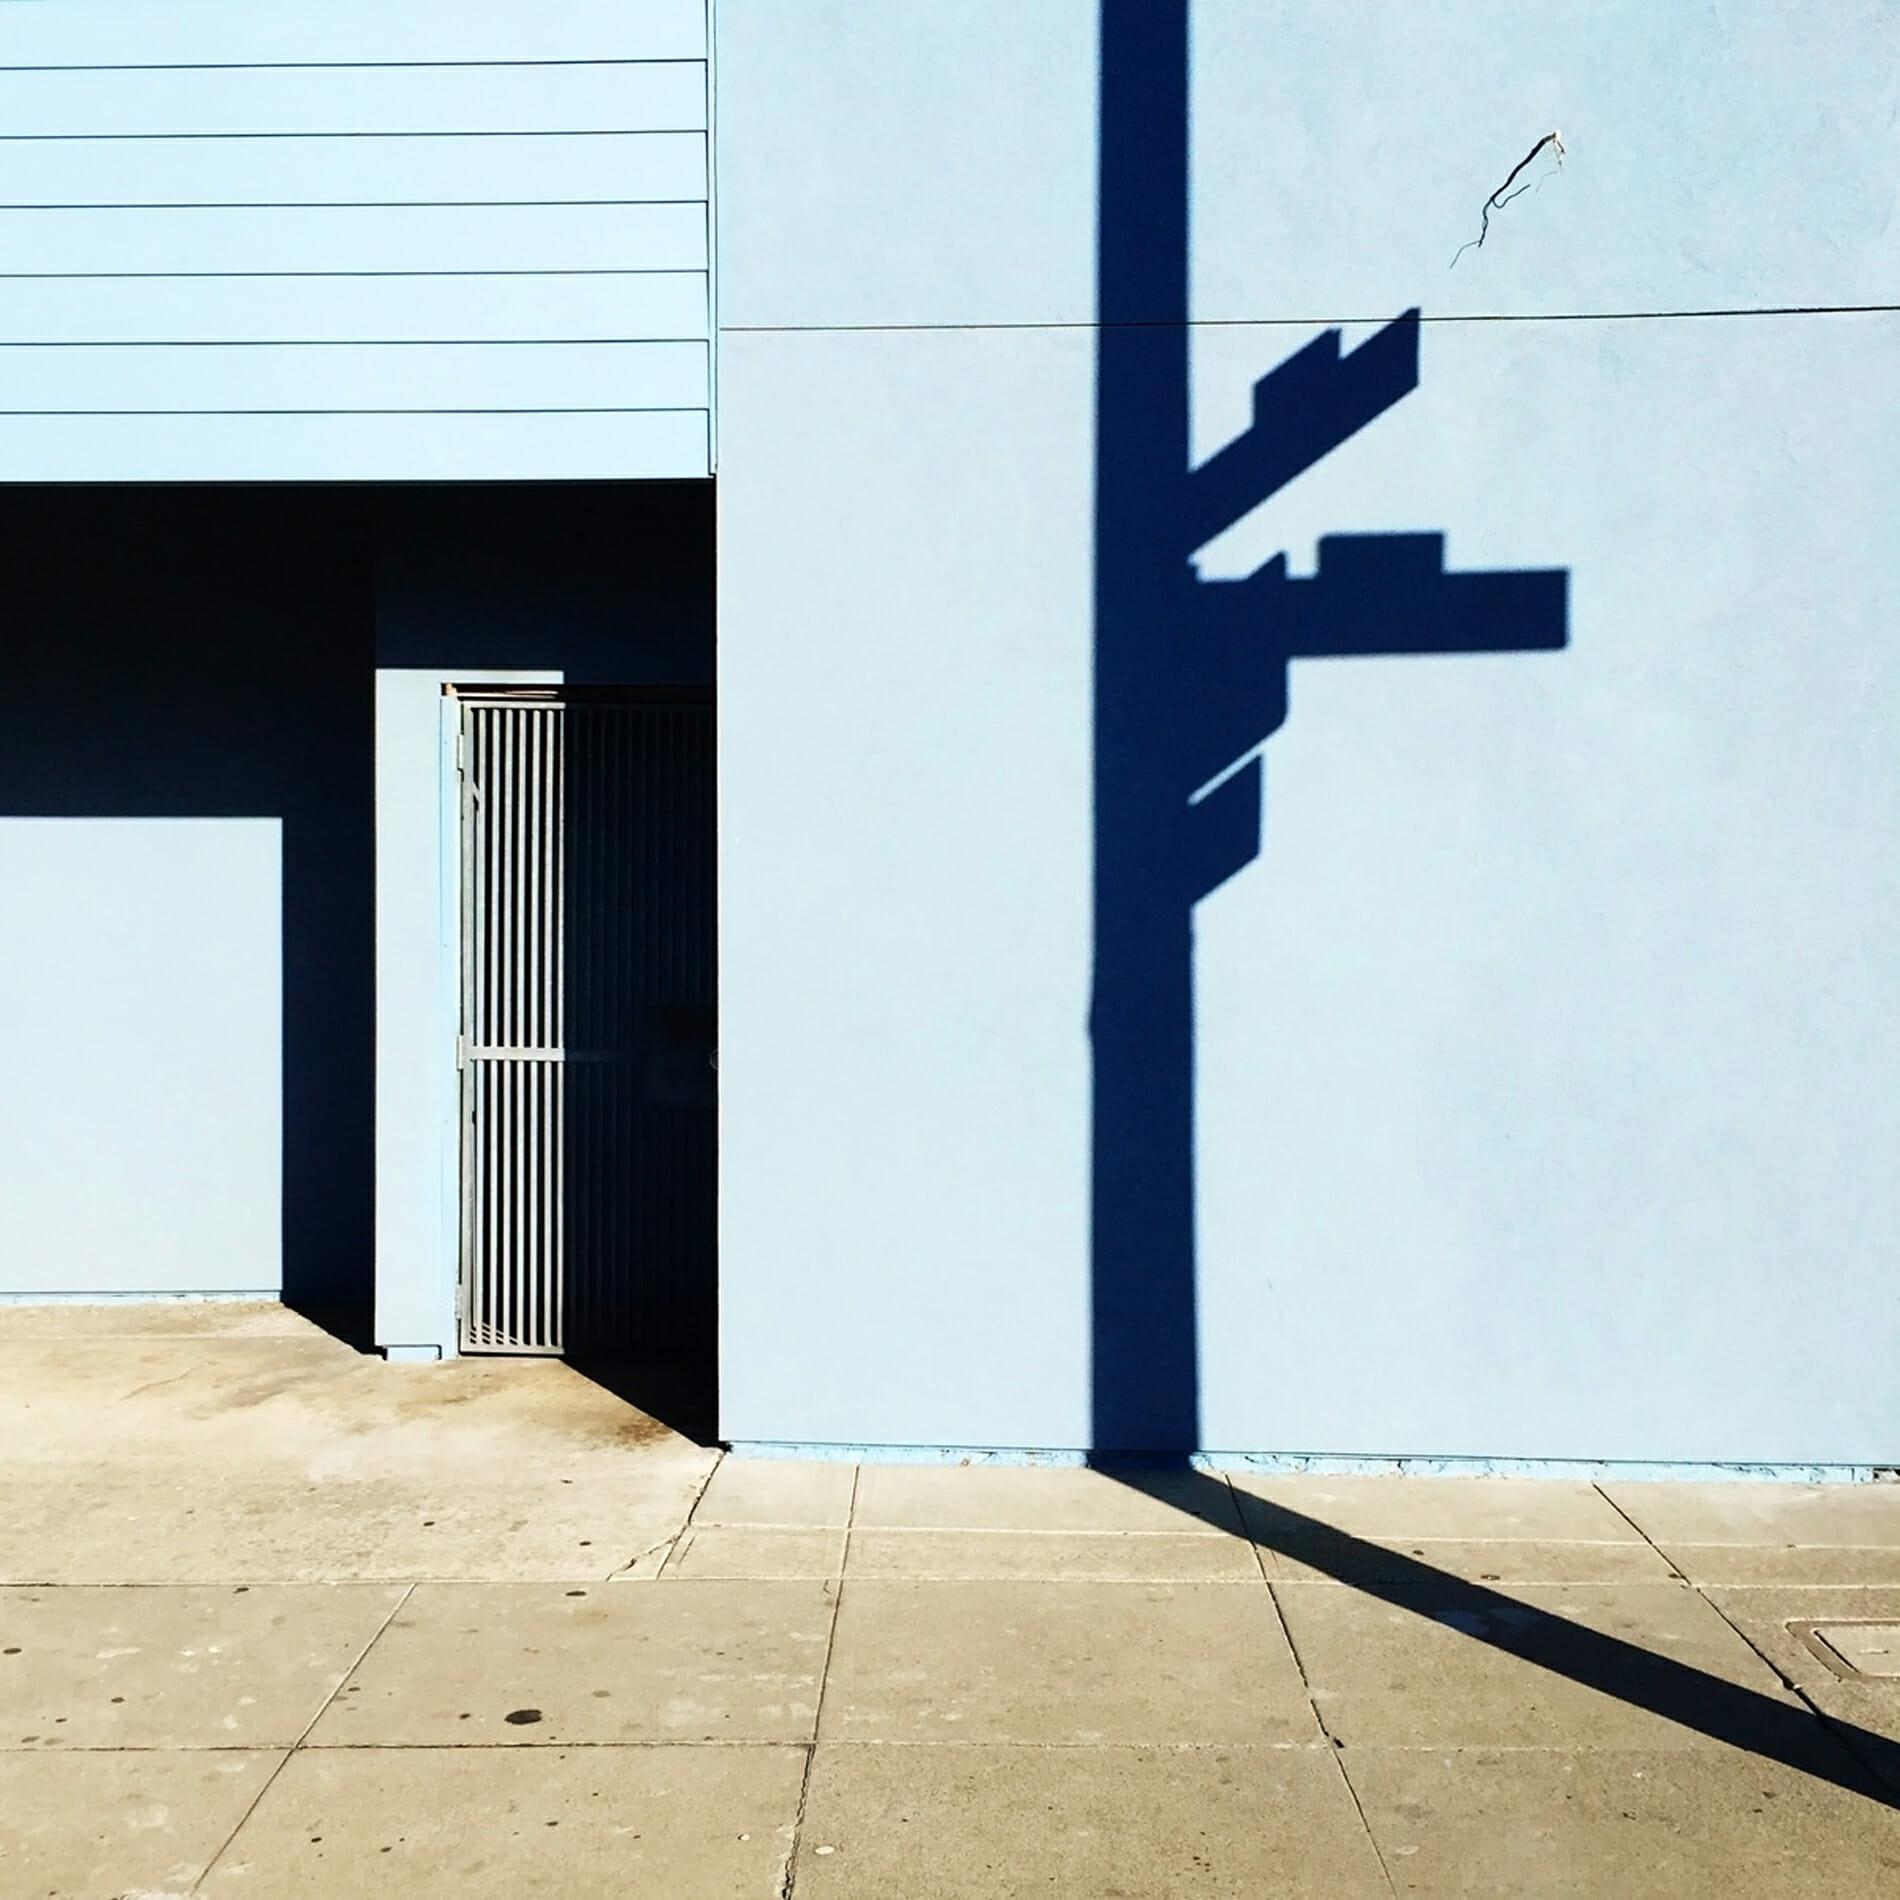 street sign shadow on motel wall